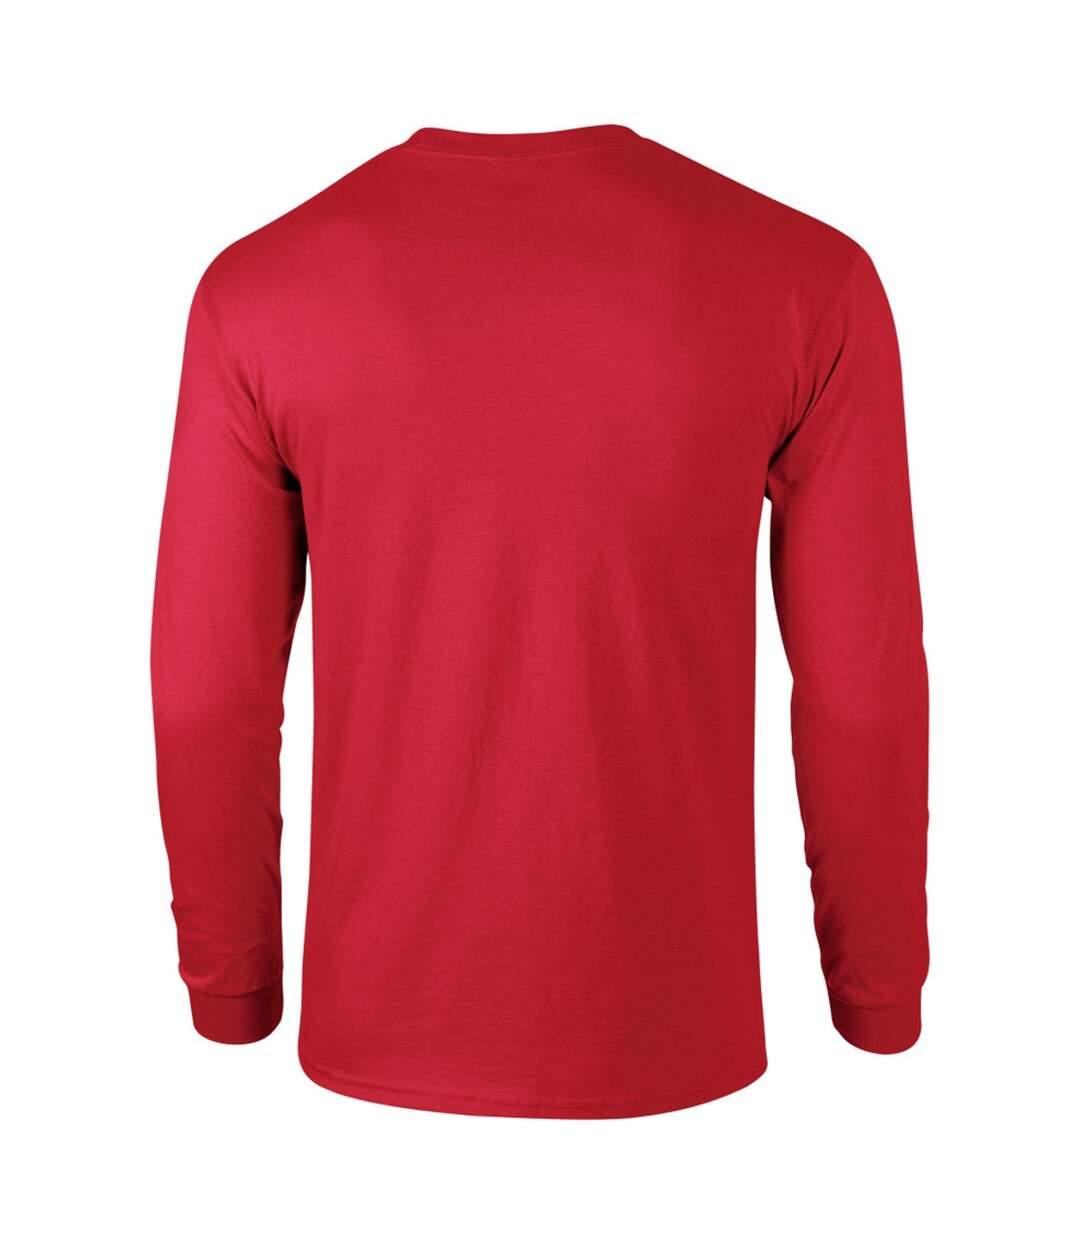 Gildan Mens Plain Crew Neck Ultra Cotton Long Sleeve T-Shirt (Red) - UTBC477